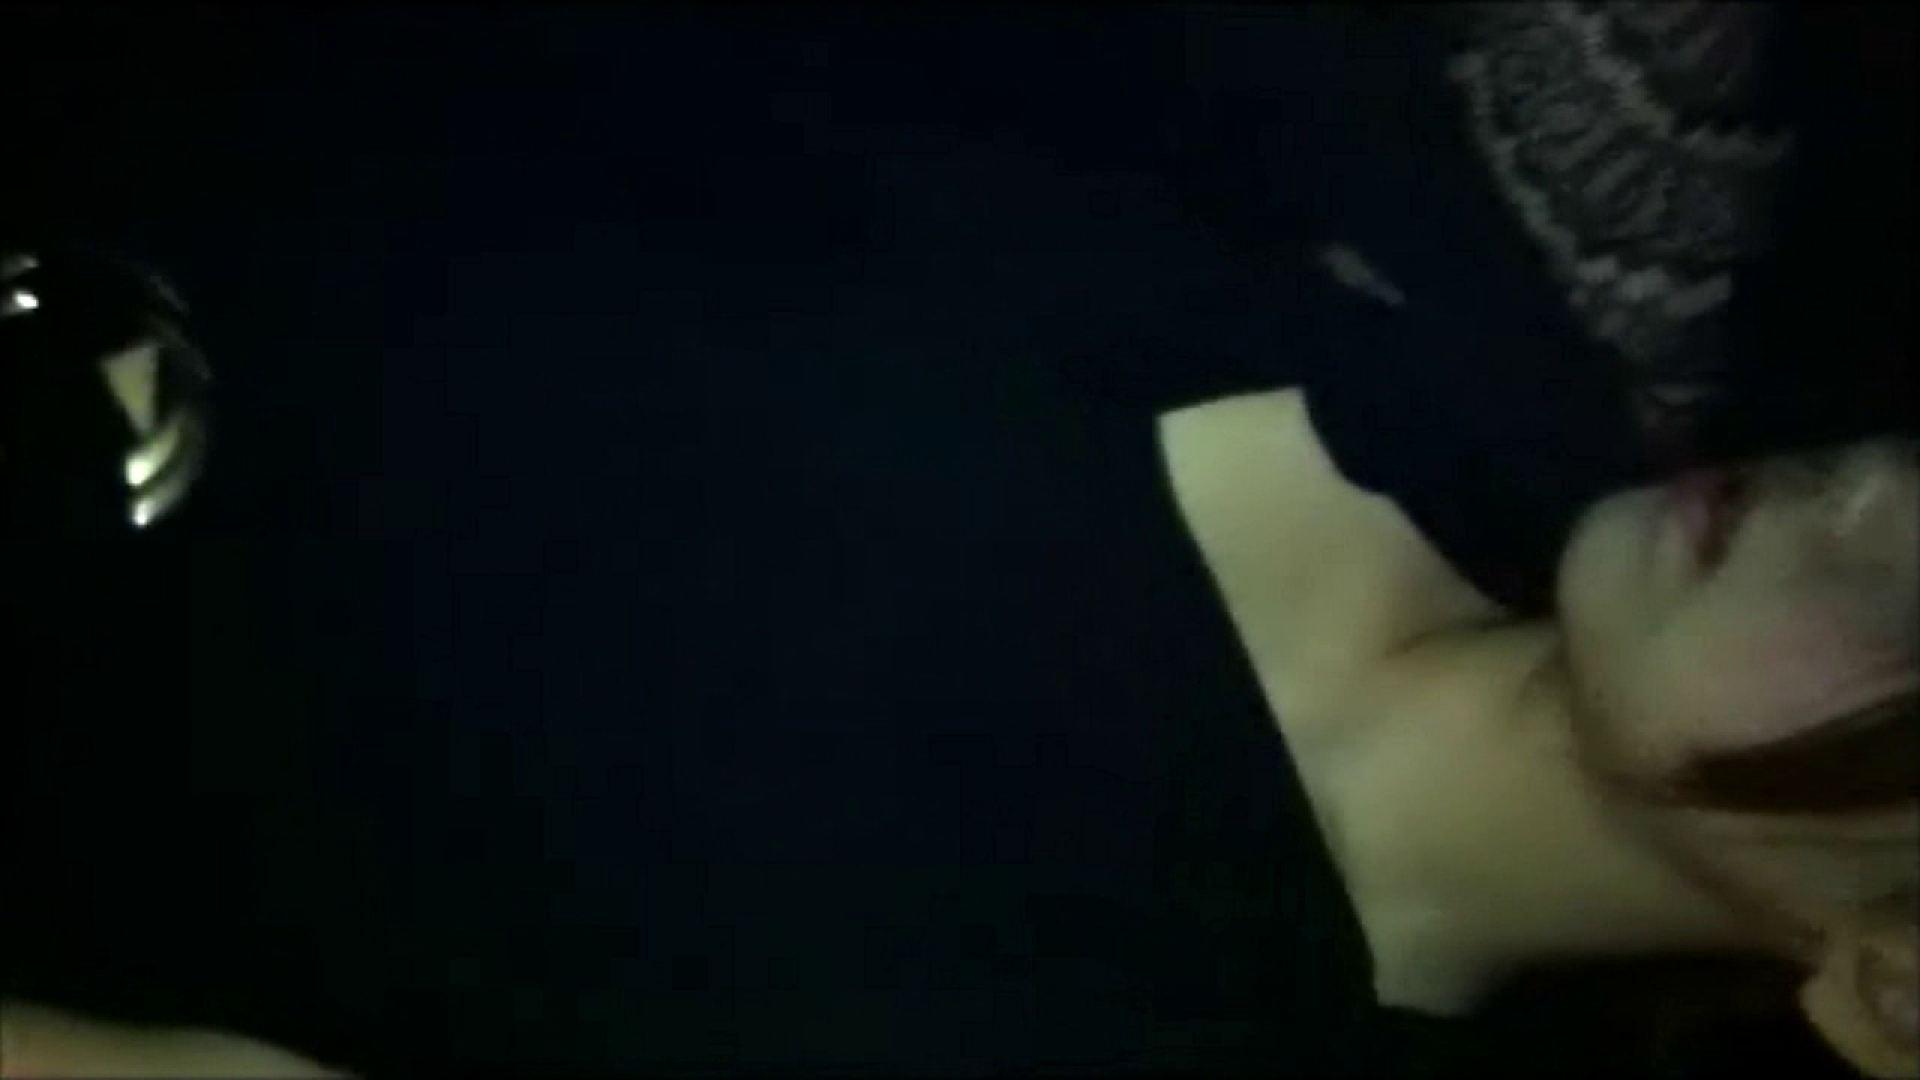 vol.5 【Nちゃん】某百貨店化粧品コーナー店員21歳 恋愛には至らず キャバ嬢達のヌード | 知人達のヌード  30連発 1